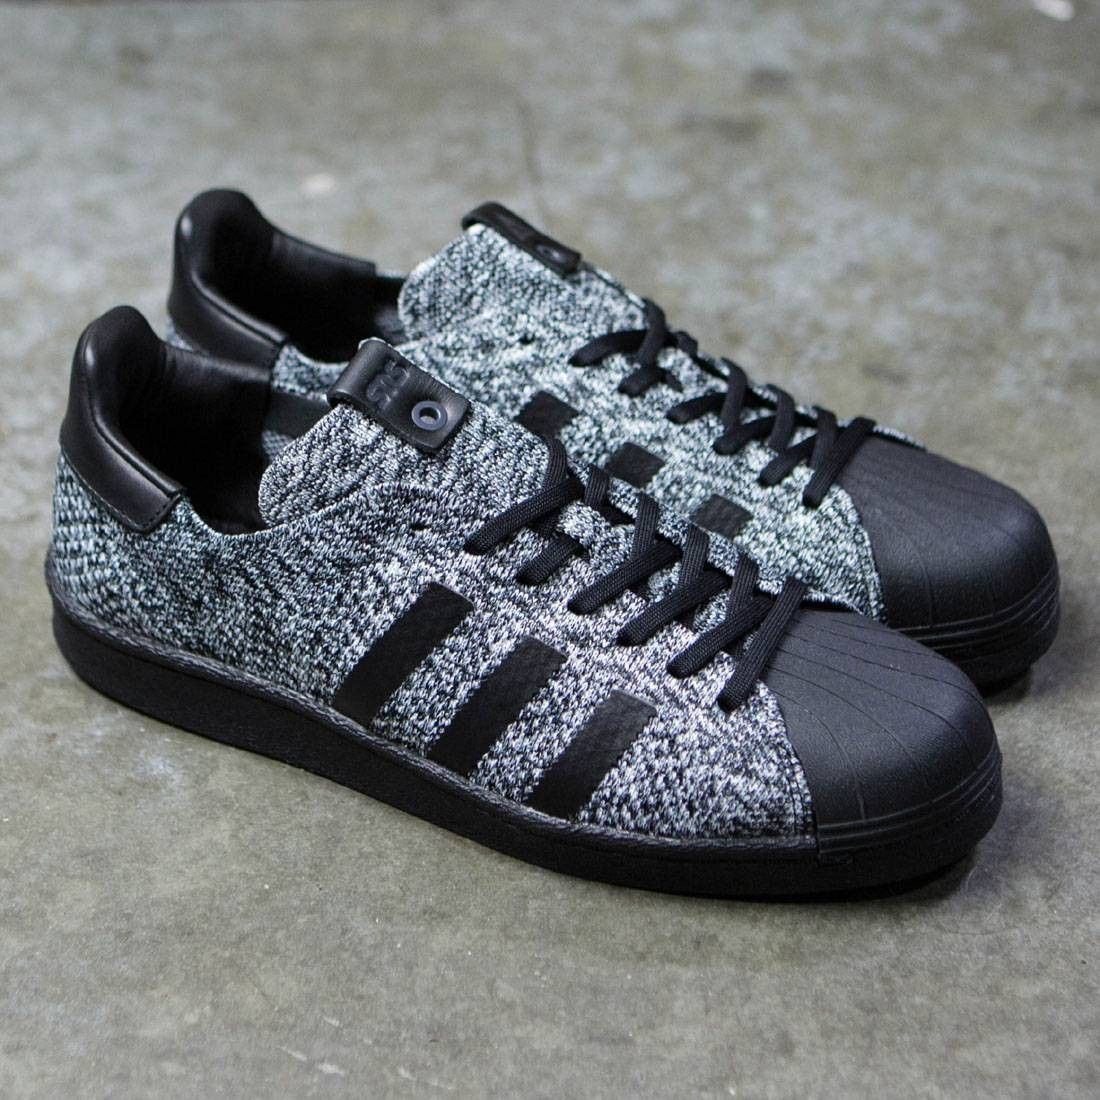 separation shoes 9f17c 428da Adidas Consortium x Sneakersnstuff x Social Status Men Superstar BOOST  Sneaker Exchange white black